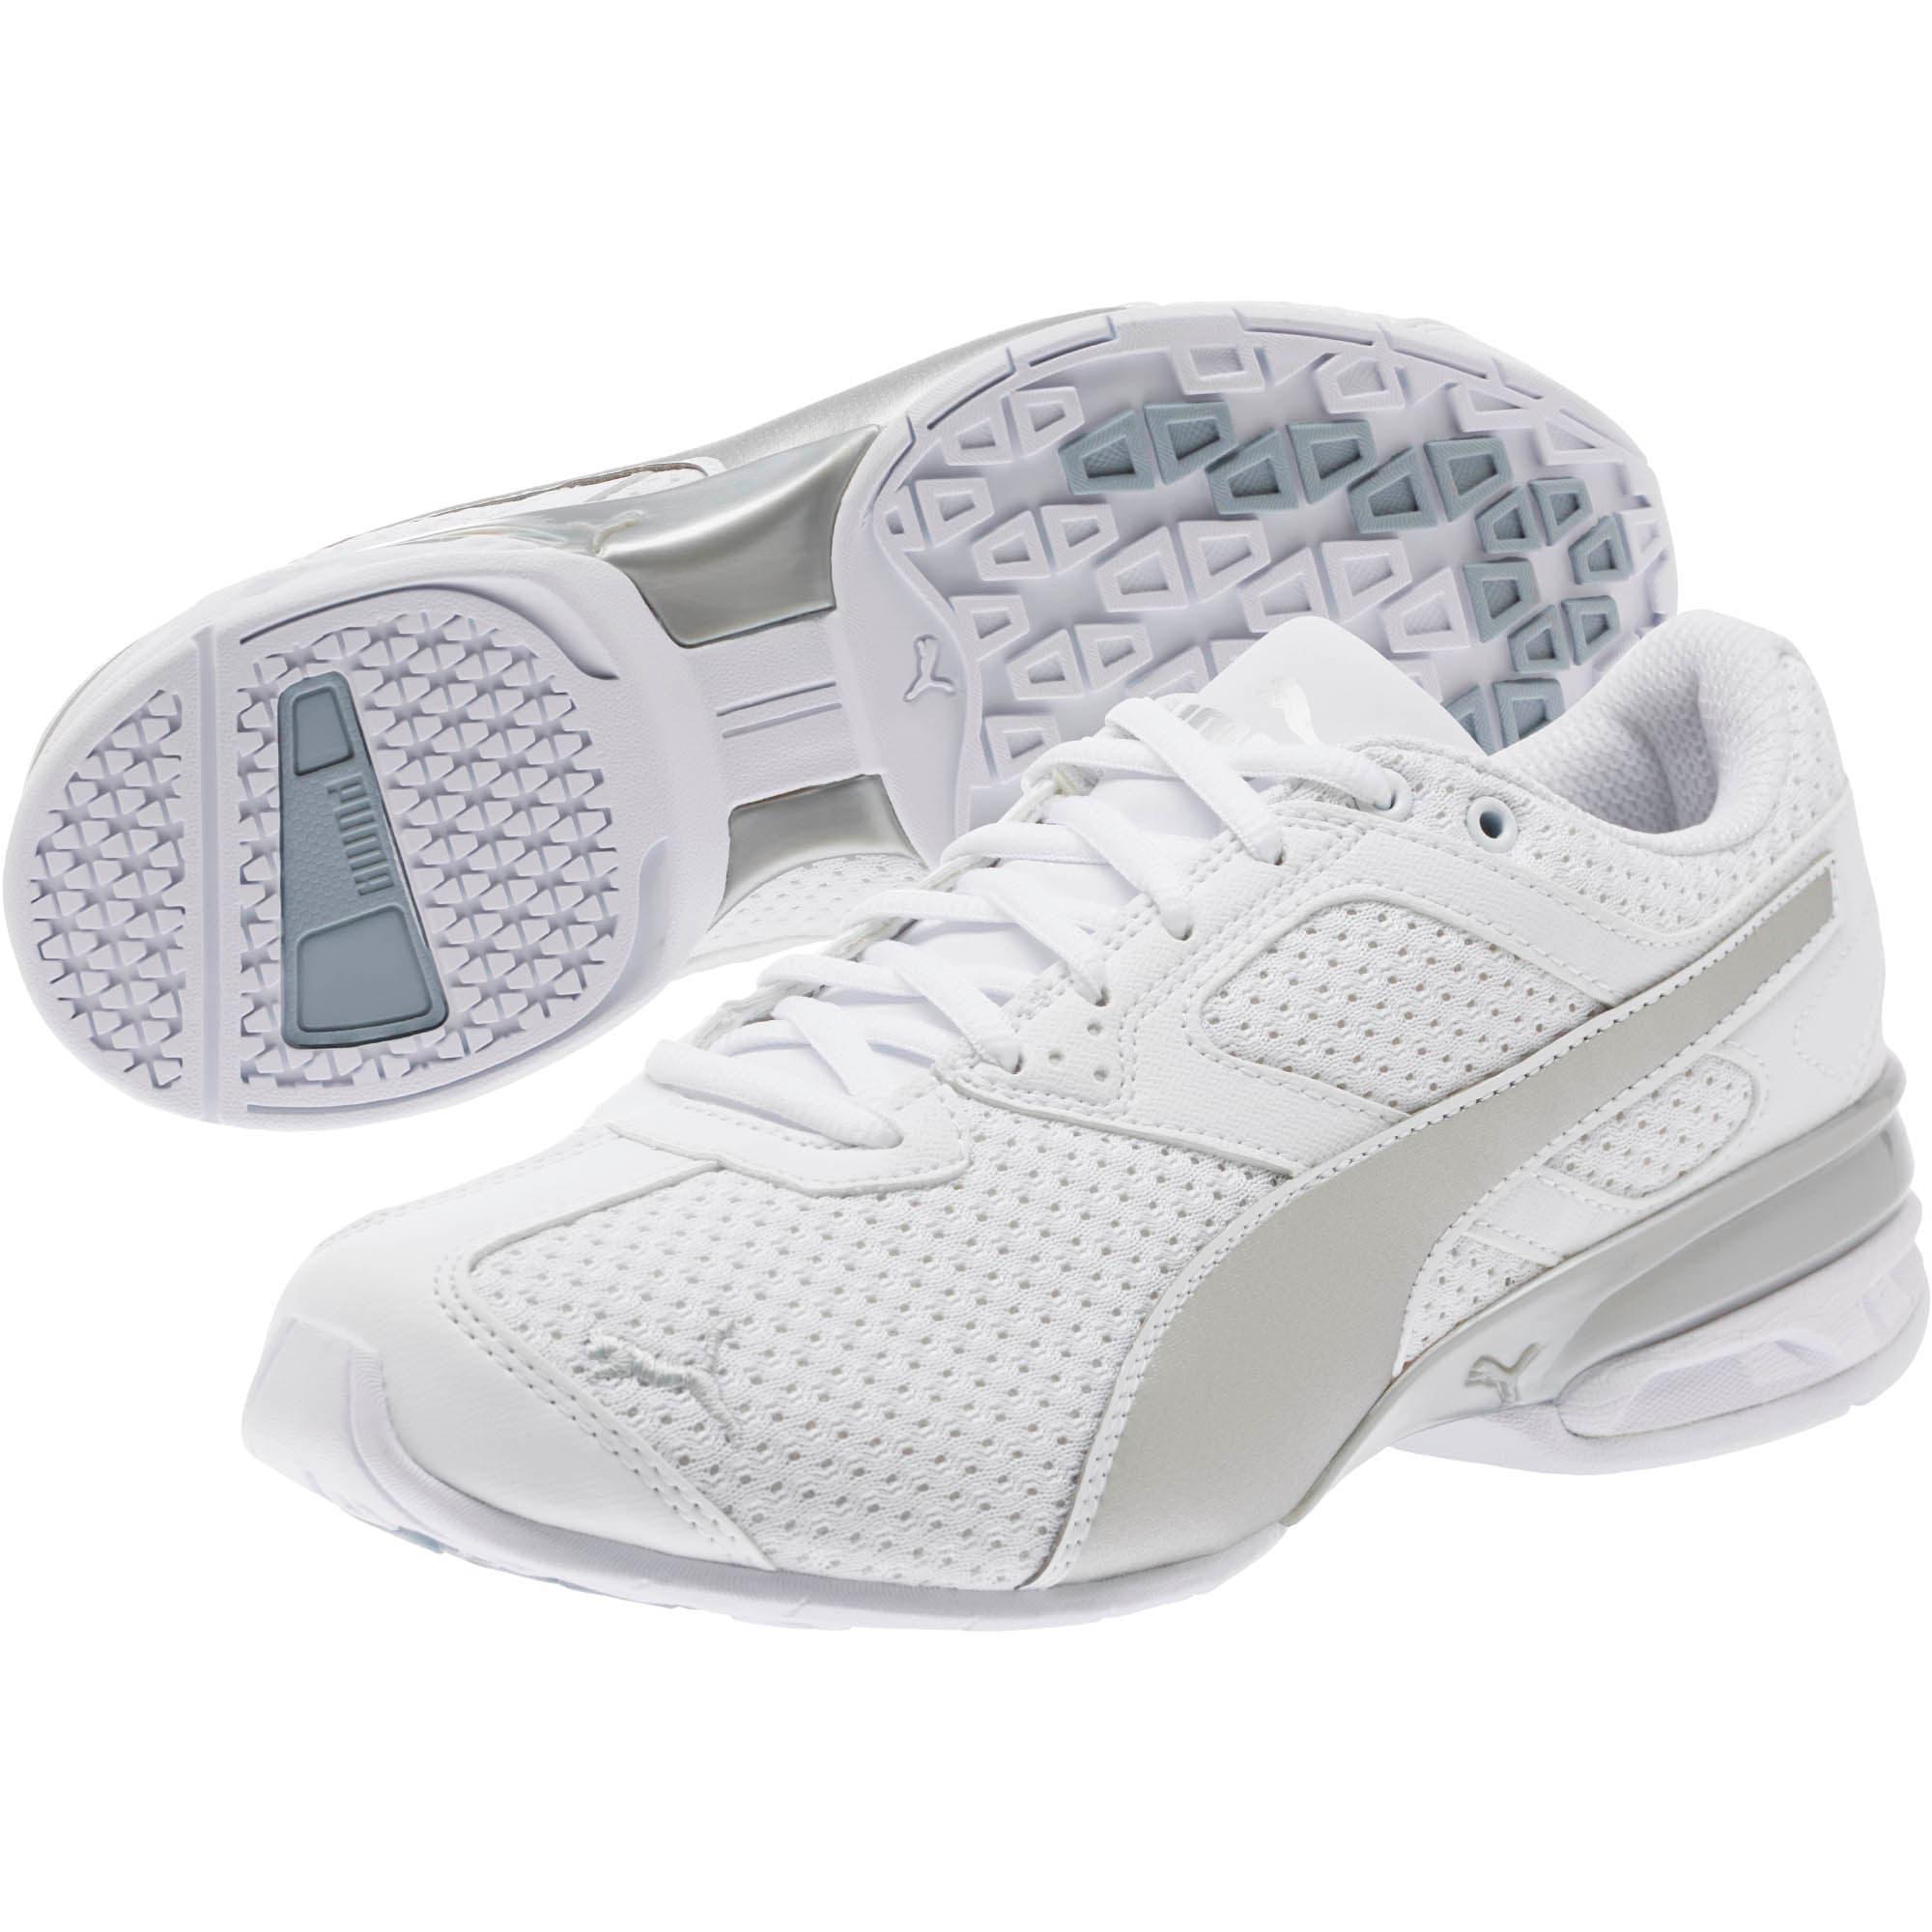 Thumbnail 2 of Tazon 6 Knit Women's Sneakers, Puma White-Puma Silver, medium